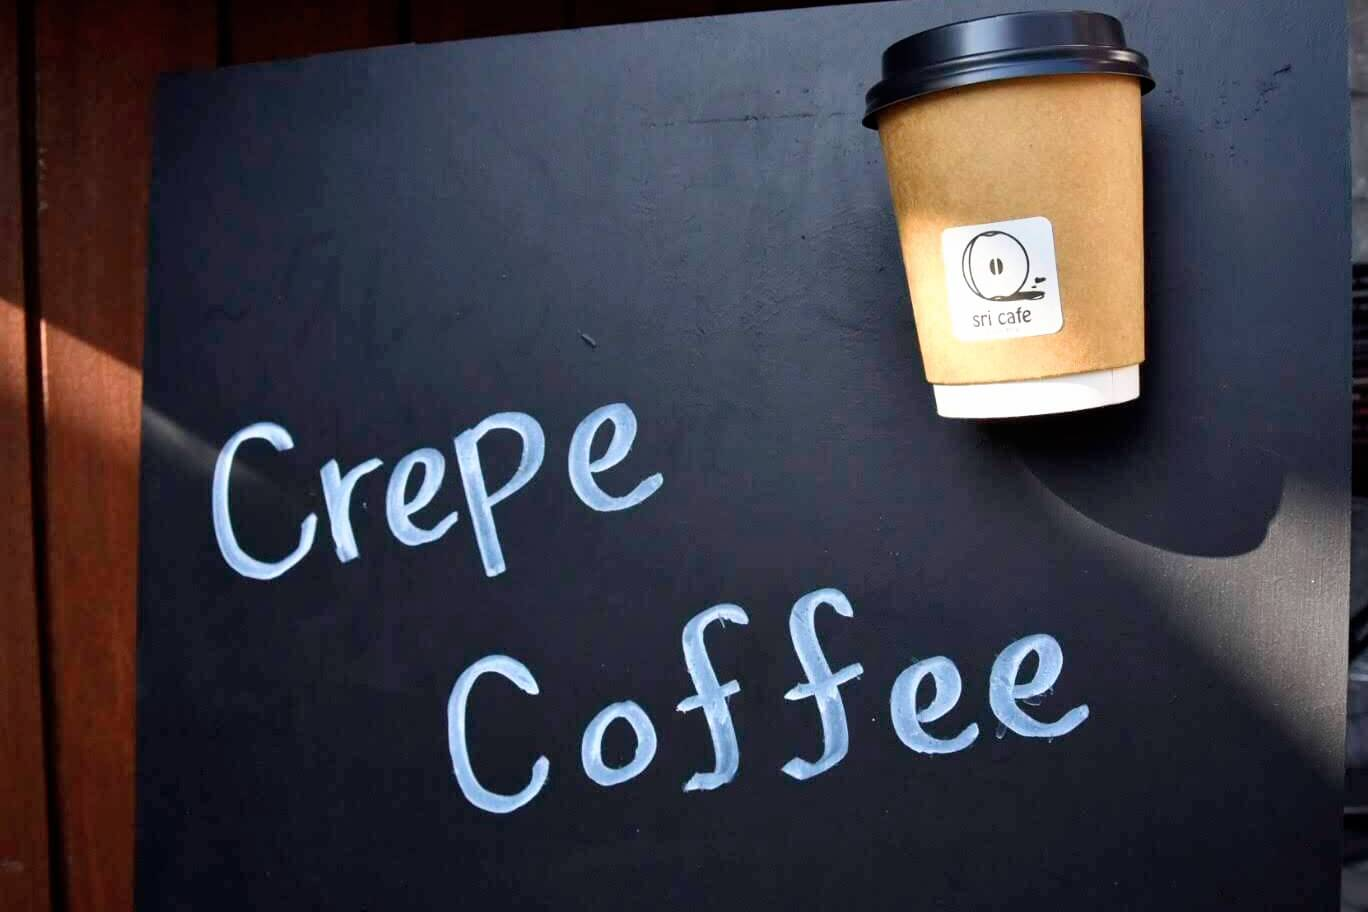 sri cafe(シュリーカフェ)の可愛い看板